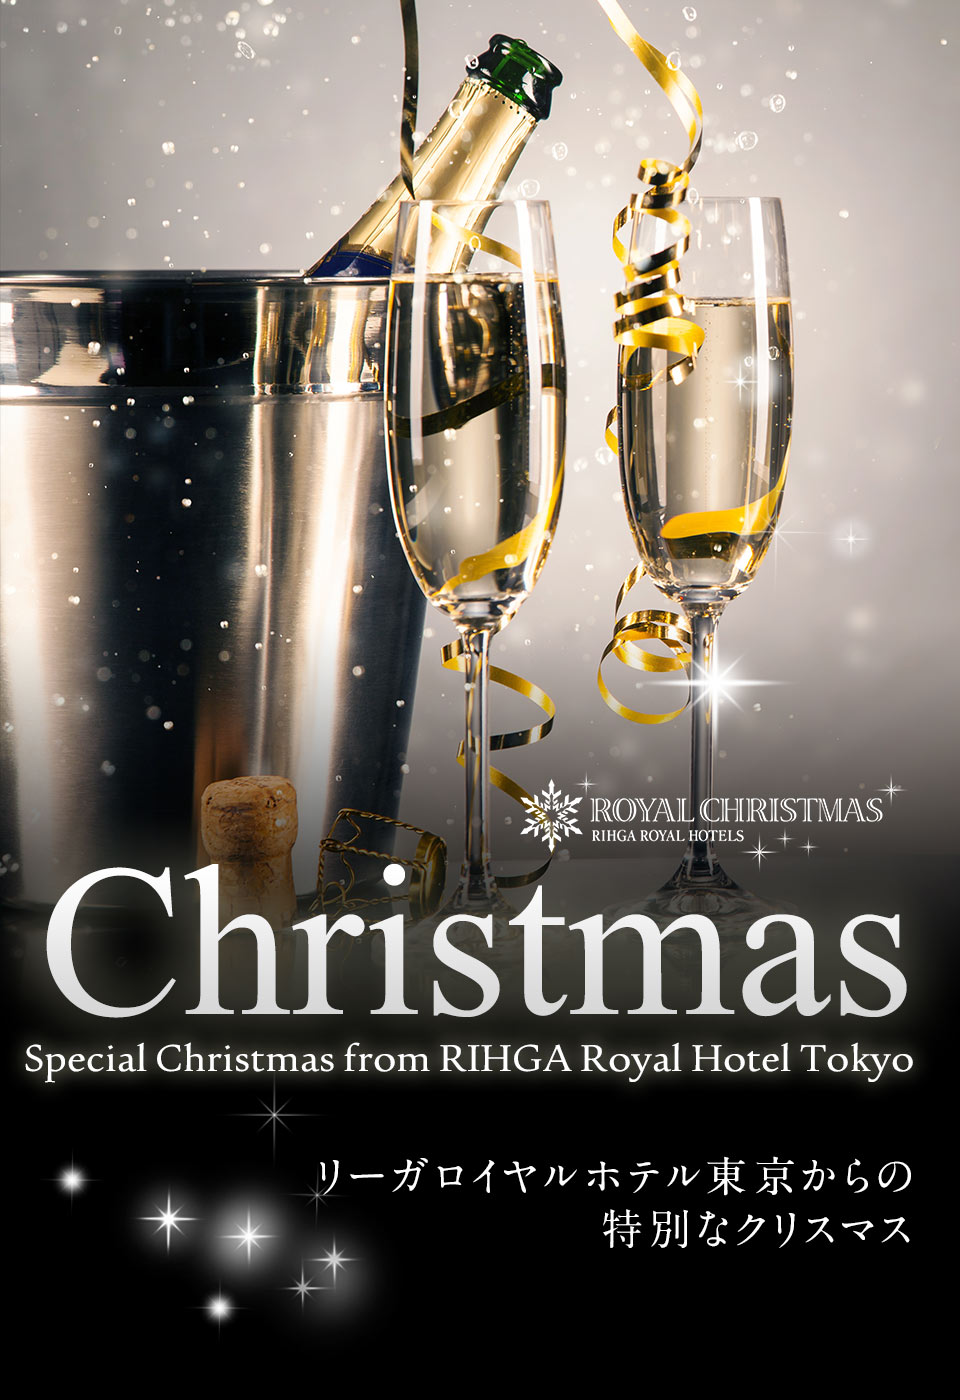 ROYAL CHIRISTMAS リーガロイヤルホテル東京からの特別なクリスマス